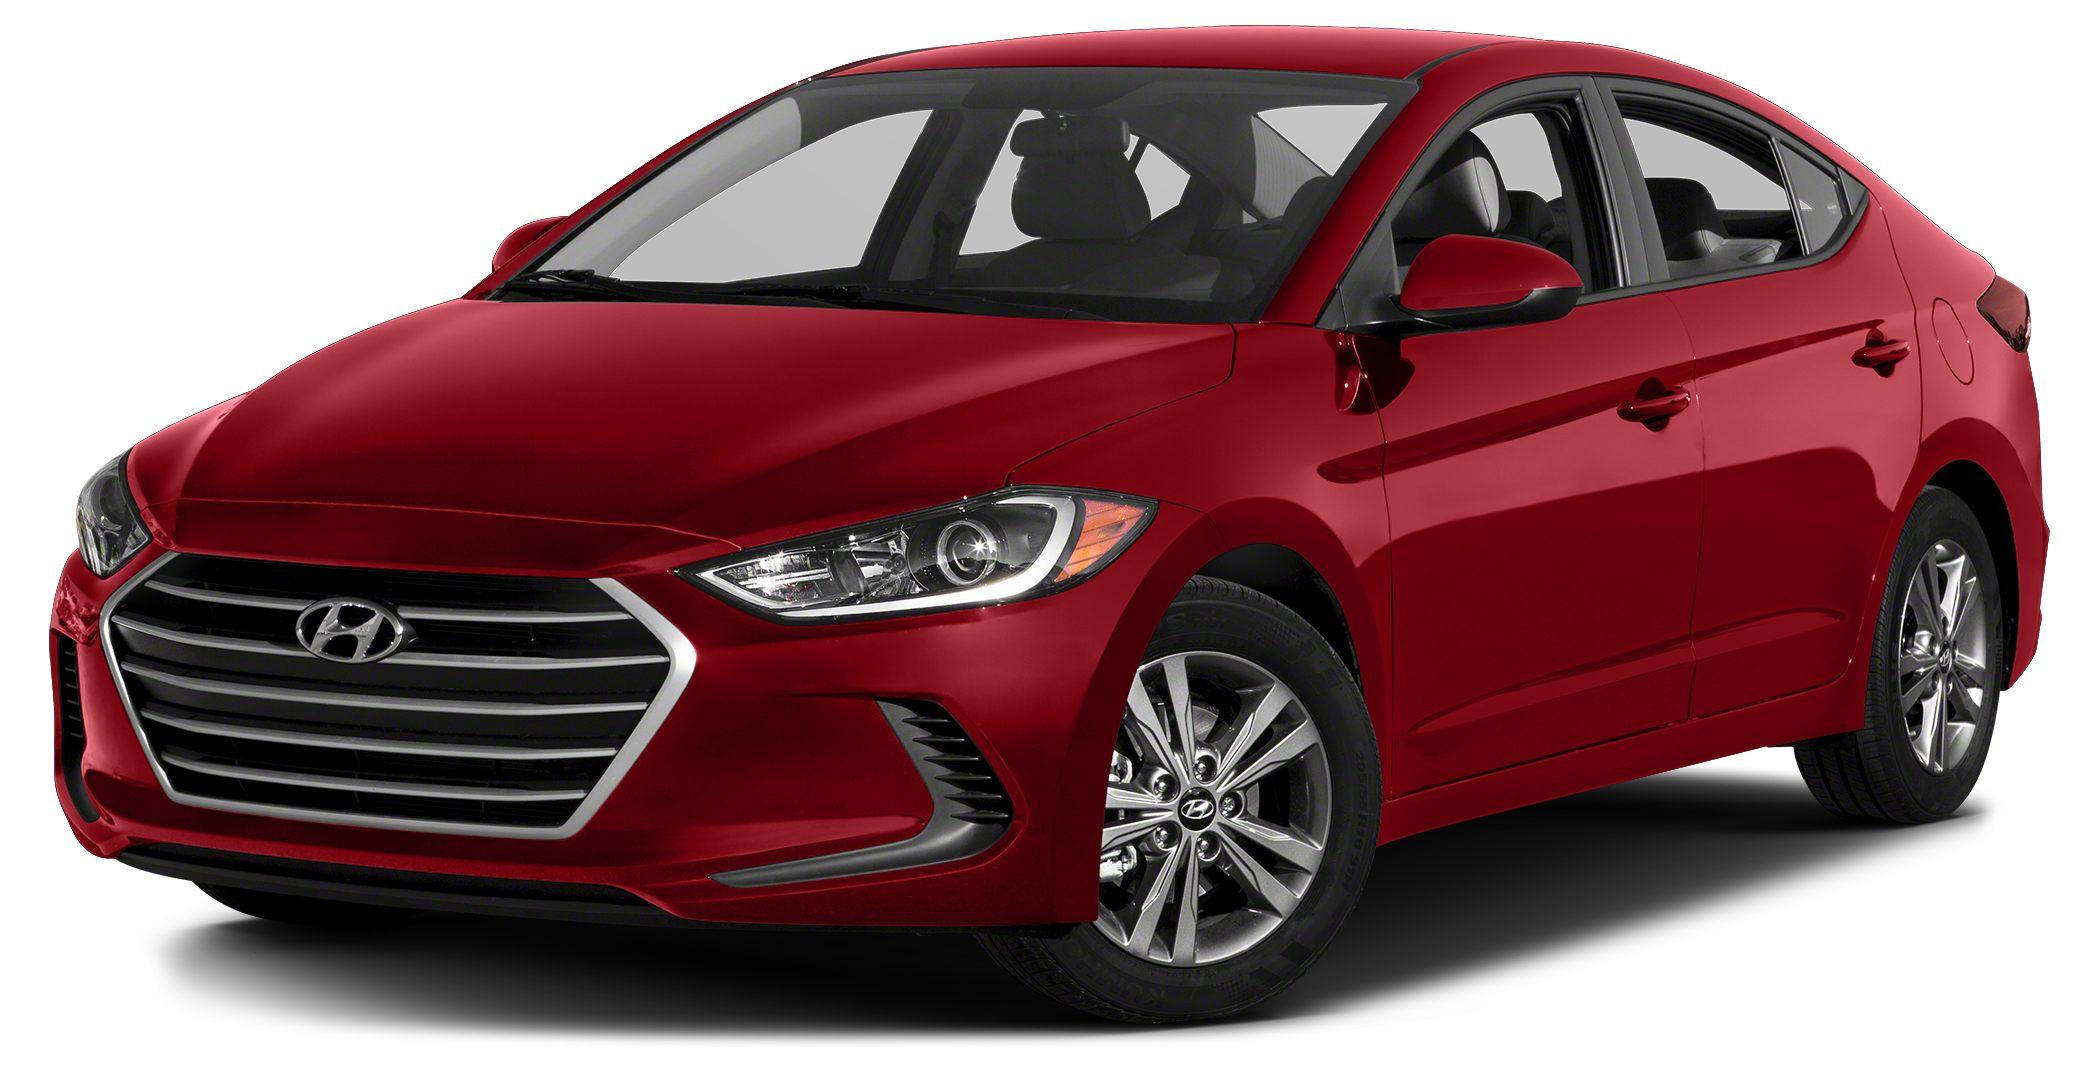 2017 Hyundai Elantra SE Miles 46676Color Scarlet Red Pearl Stock R4921 VIN KMHD74LF1HU084415